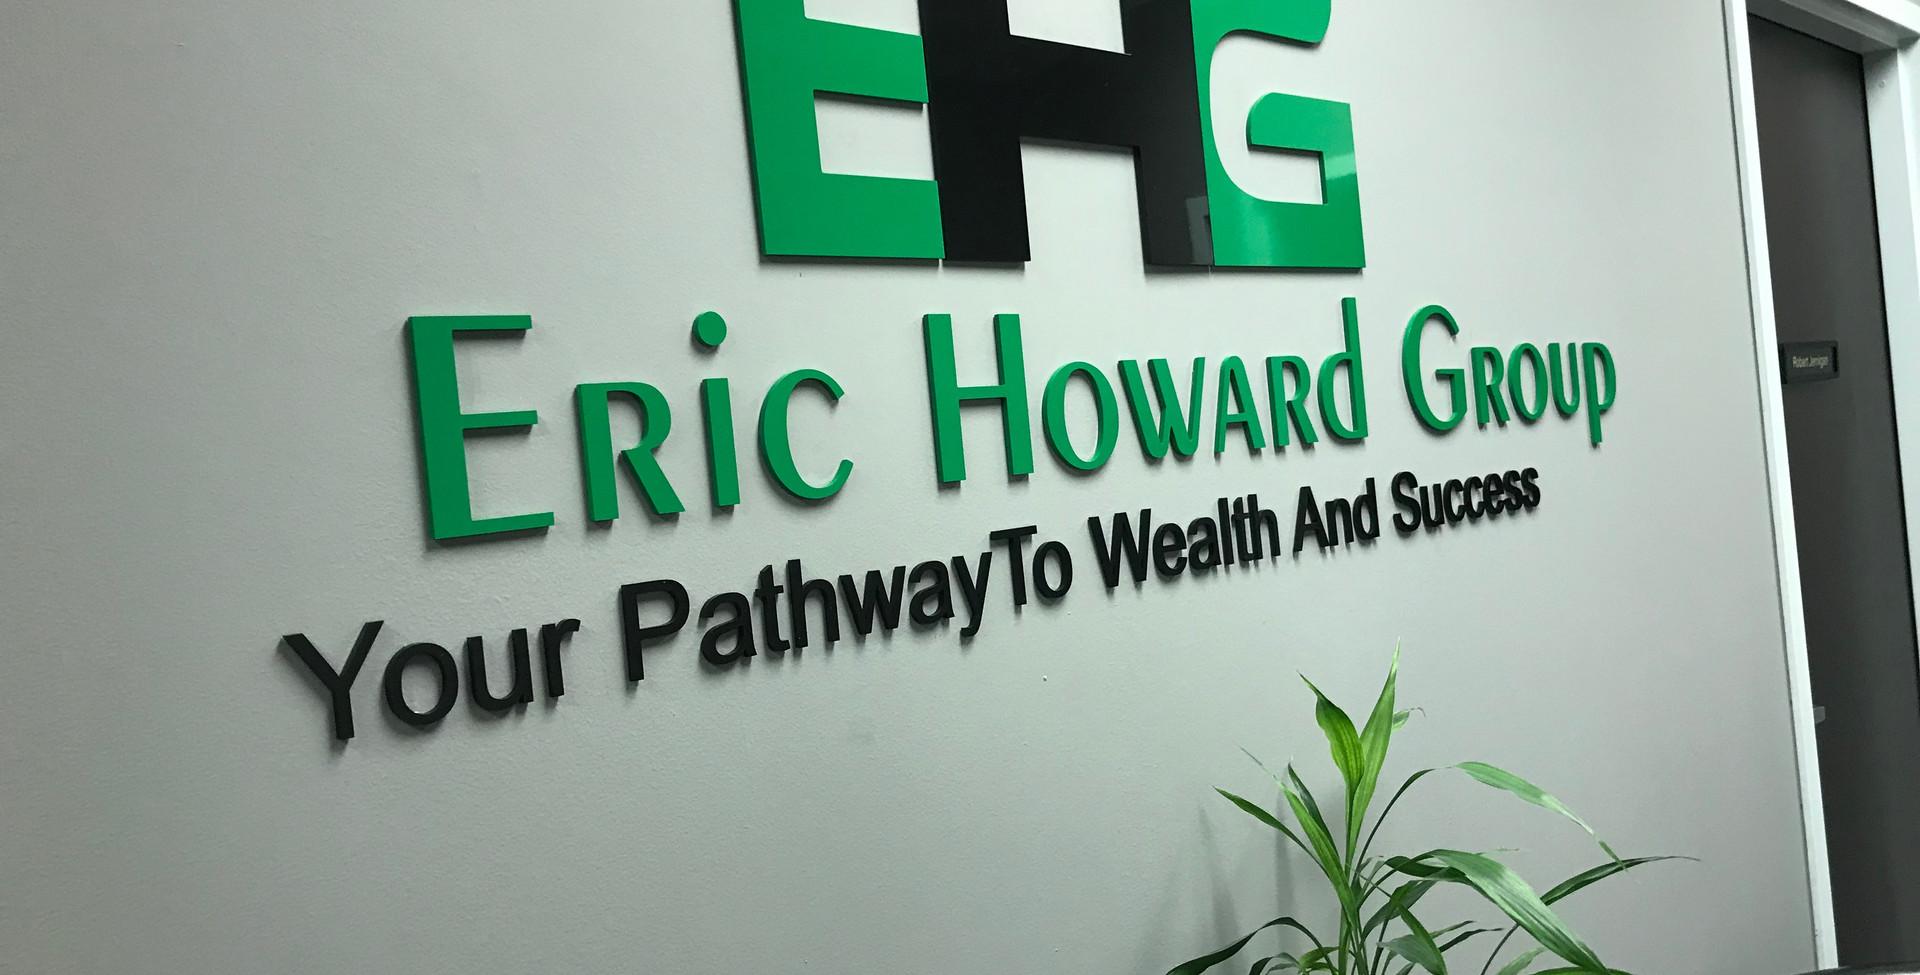 Eric Howard Group